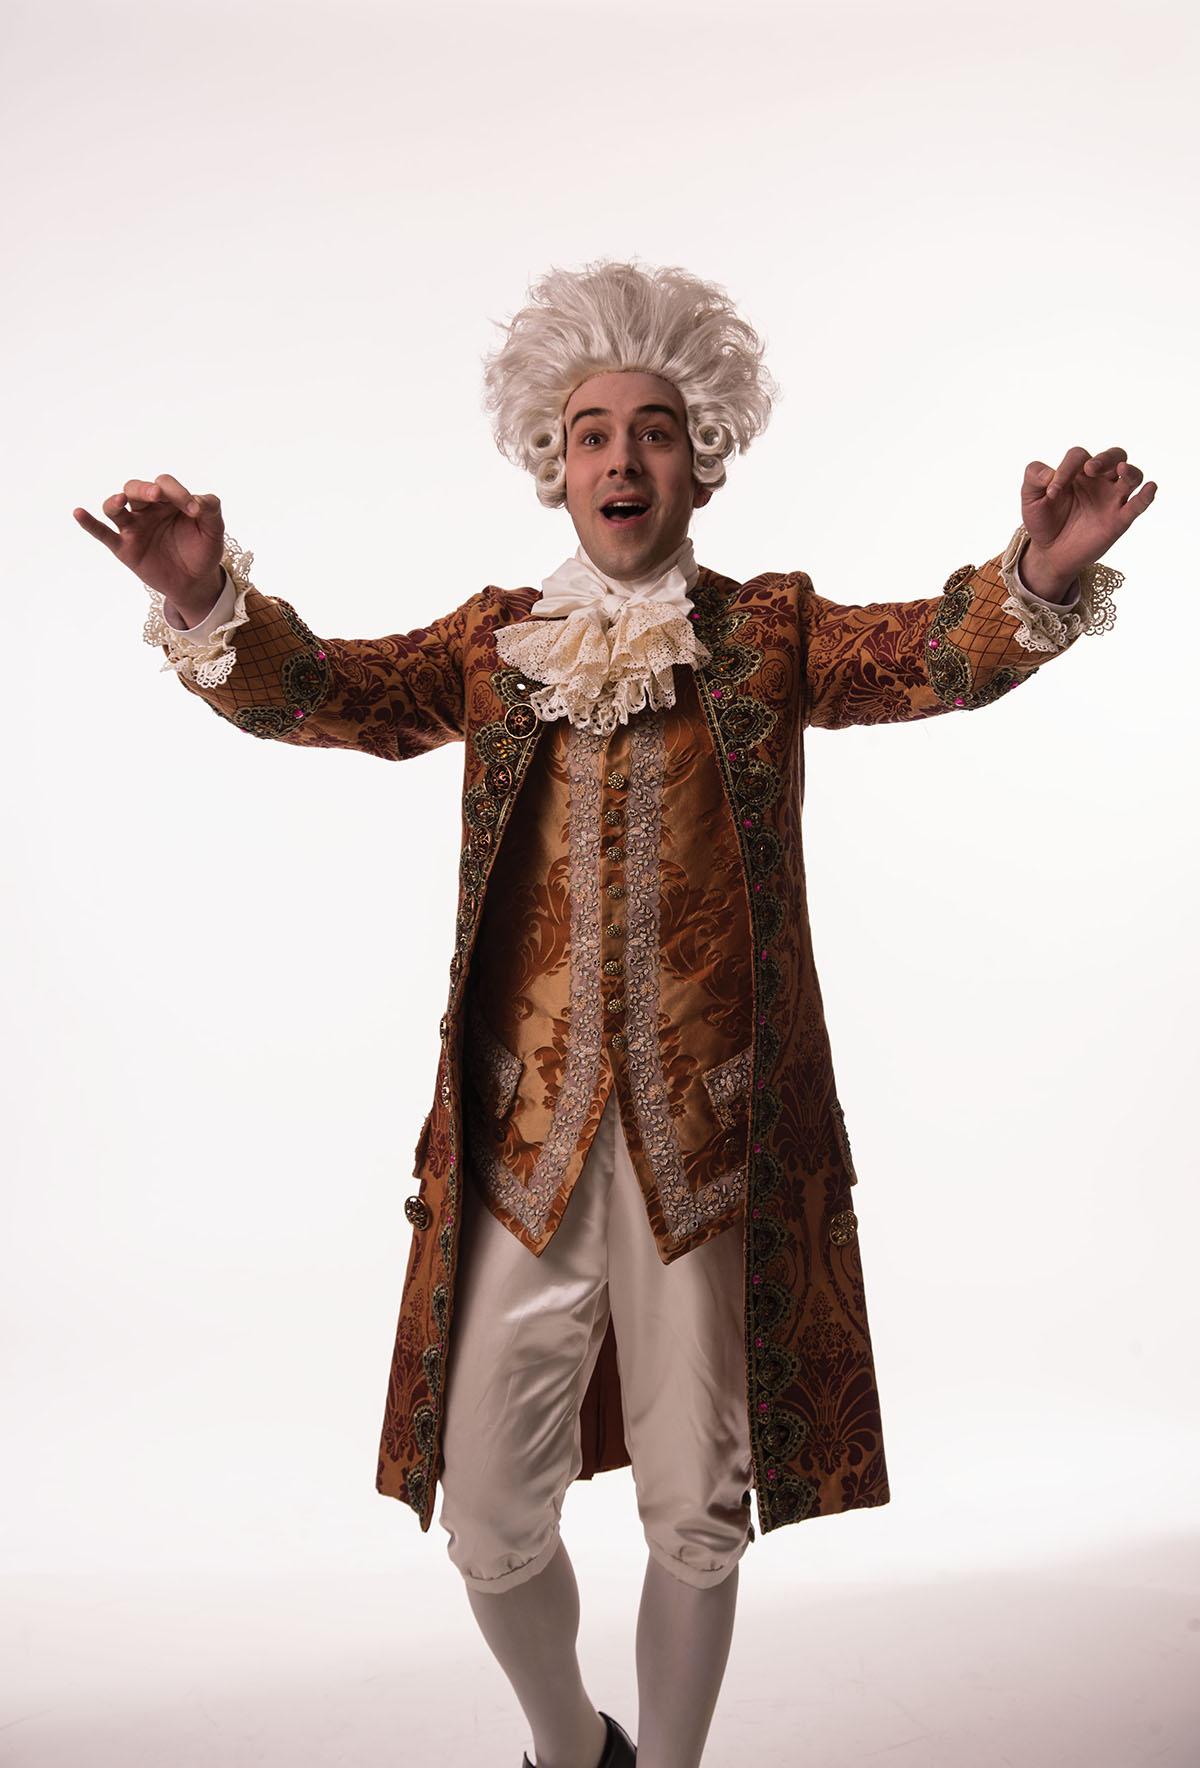 Tasso Feldman (Mozart)